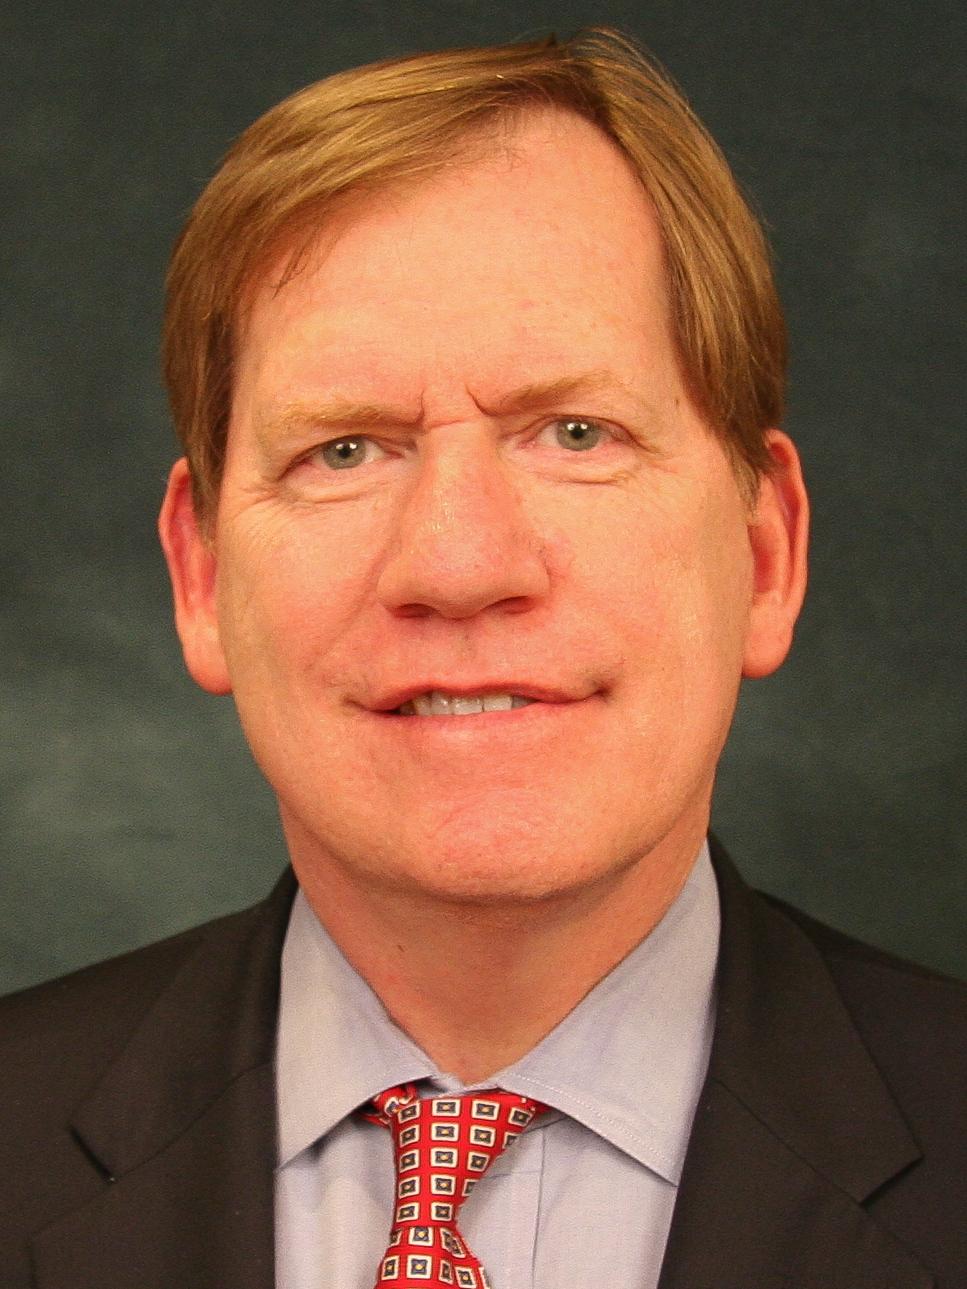 Michael A. Edwards